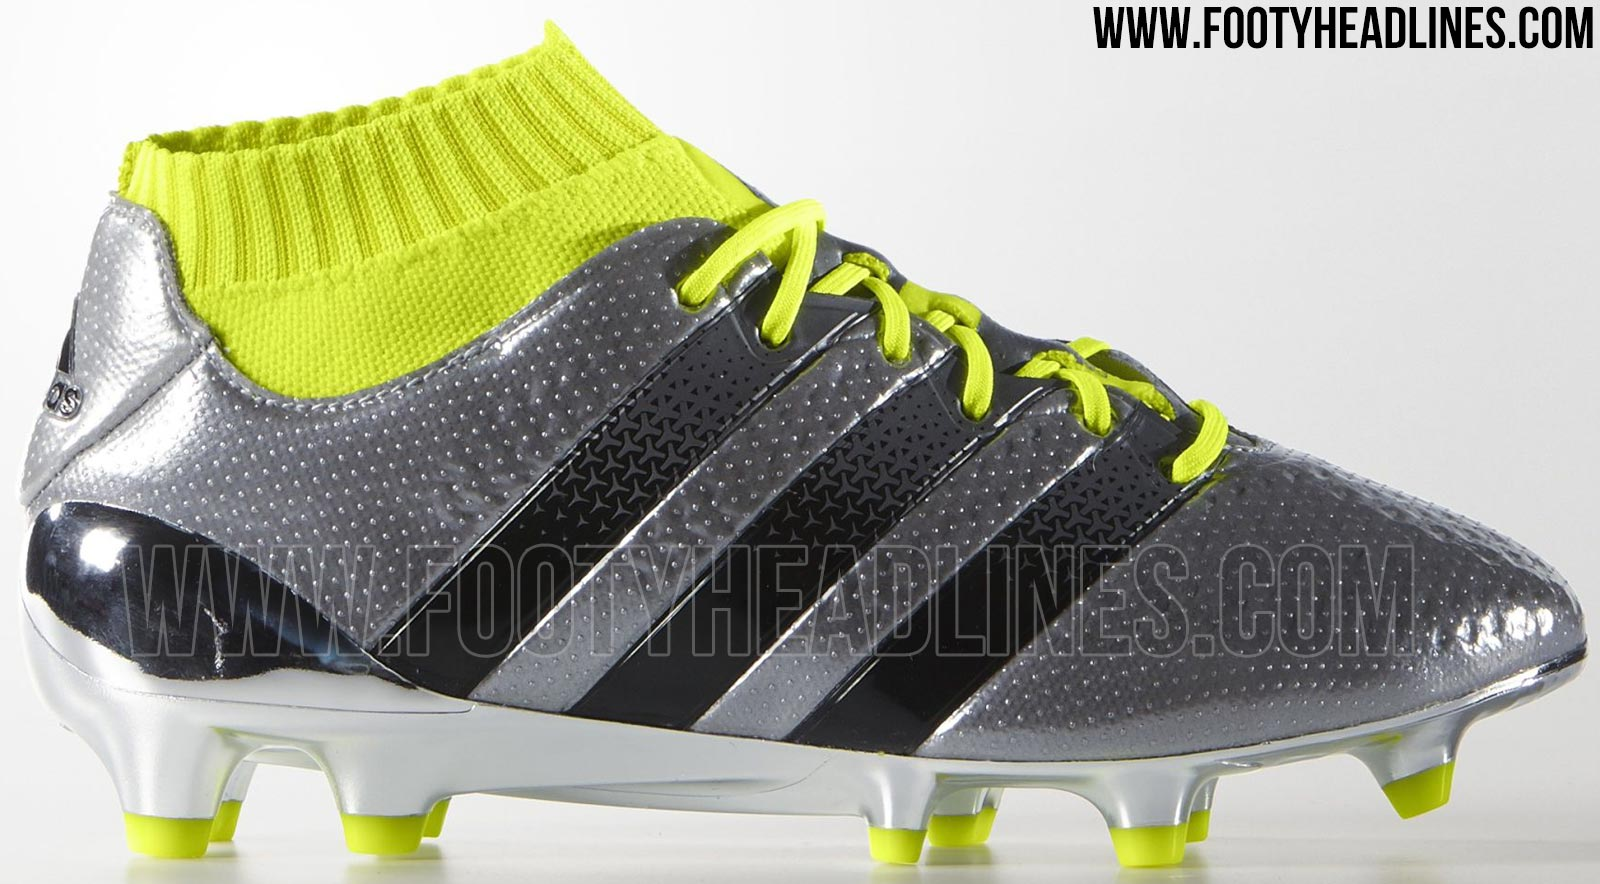 adidas ace 16 football shoes